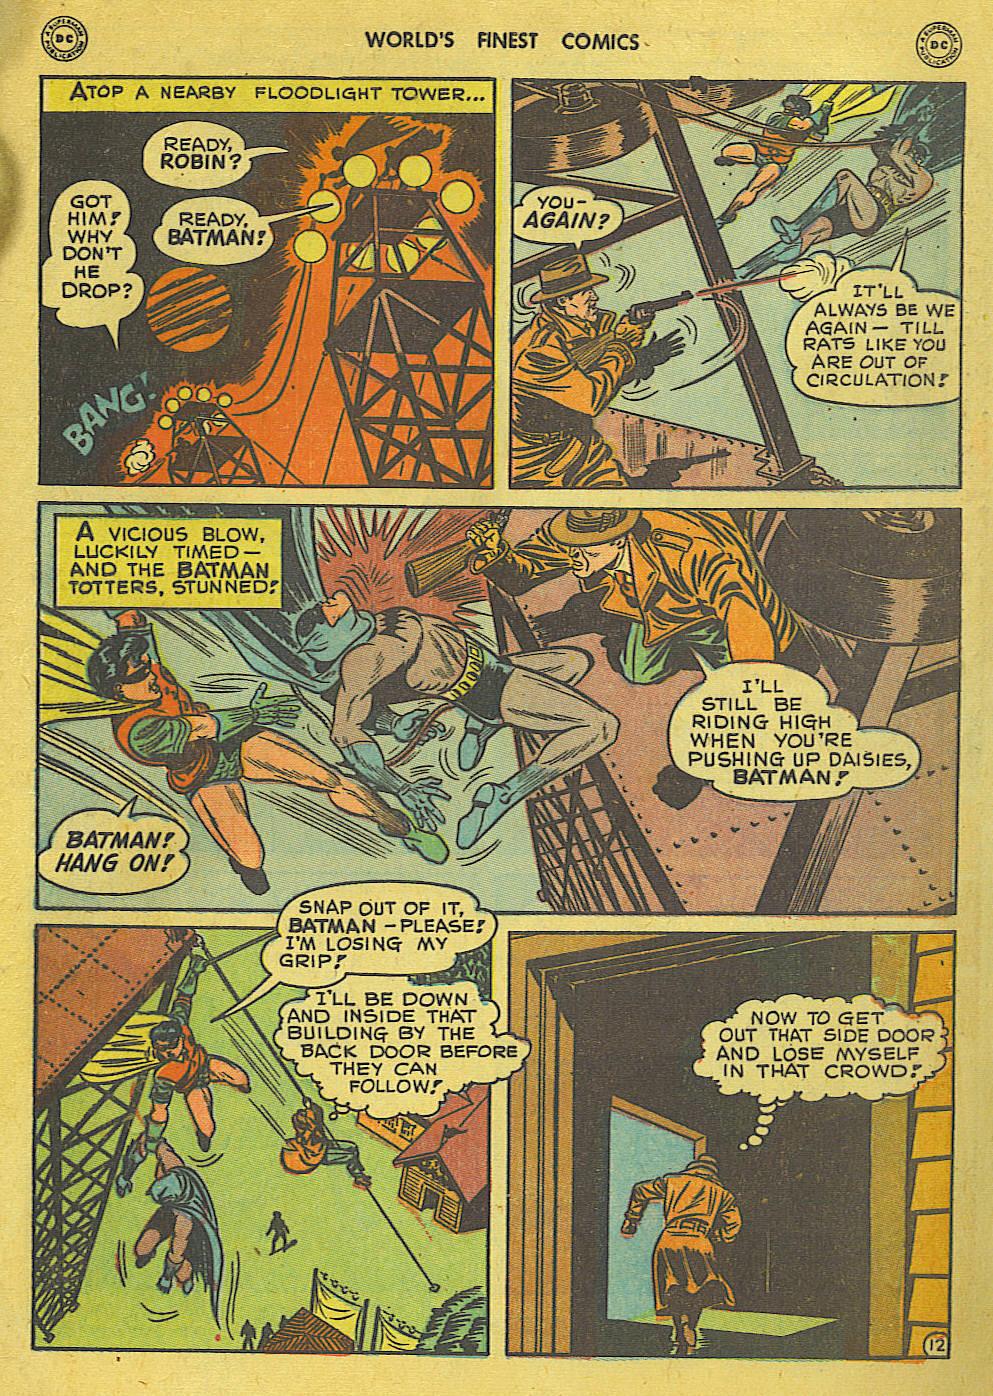 Read online World's Finest Comics comic -  Issue #34 - 73